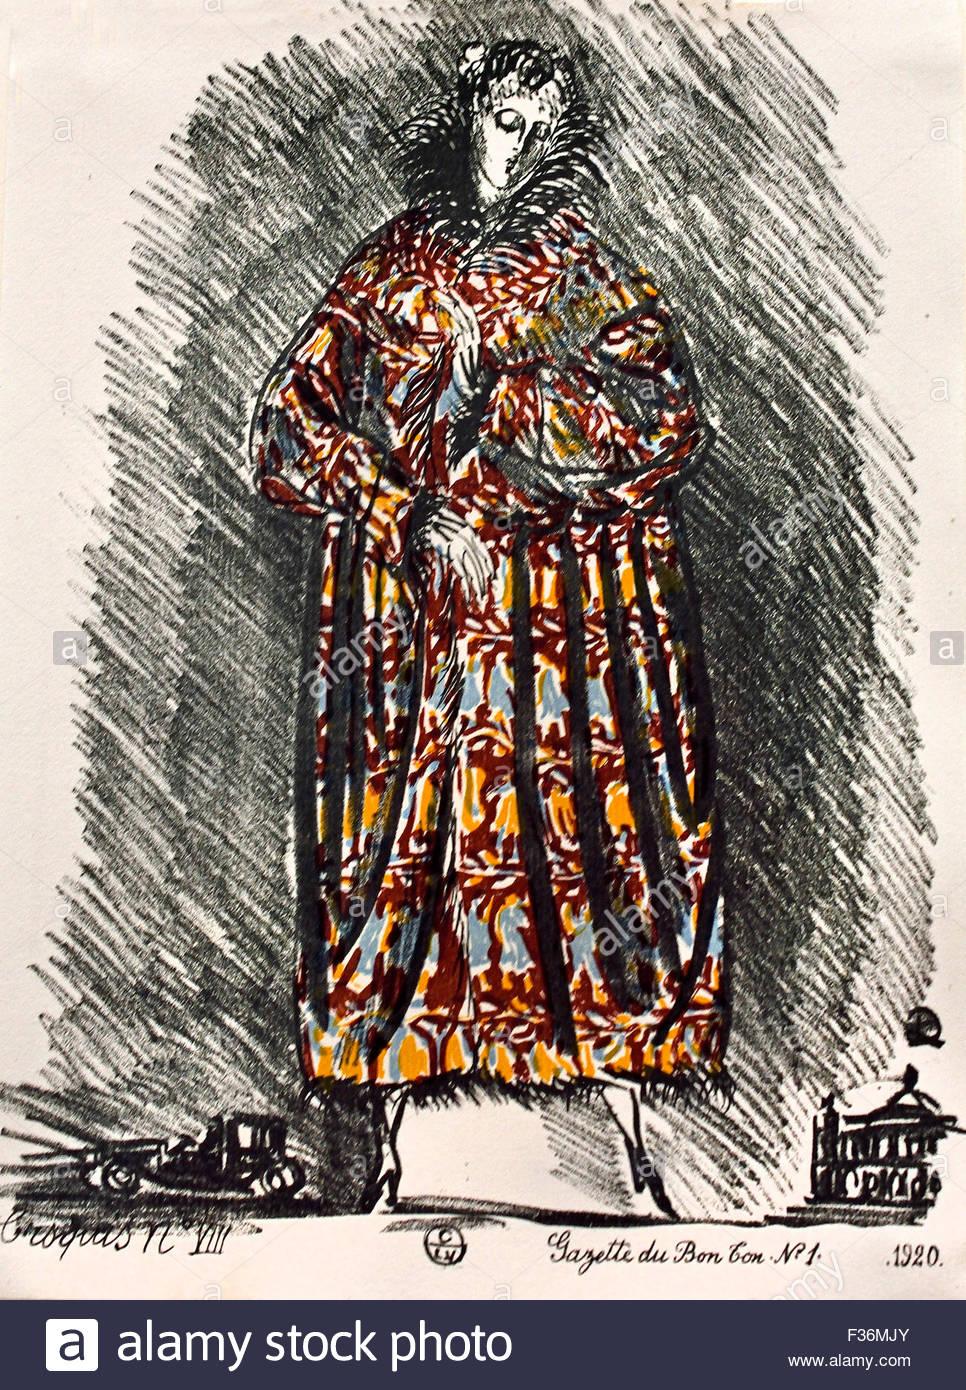 mode skizzen f r sommer kleider 1920 gazette du bon ton kunst modi frivolites von raoul dufy. Black Bedroom Furniture Sets. Home Design Ideas